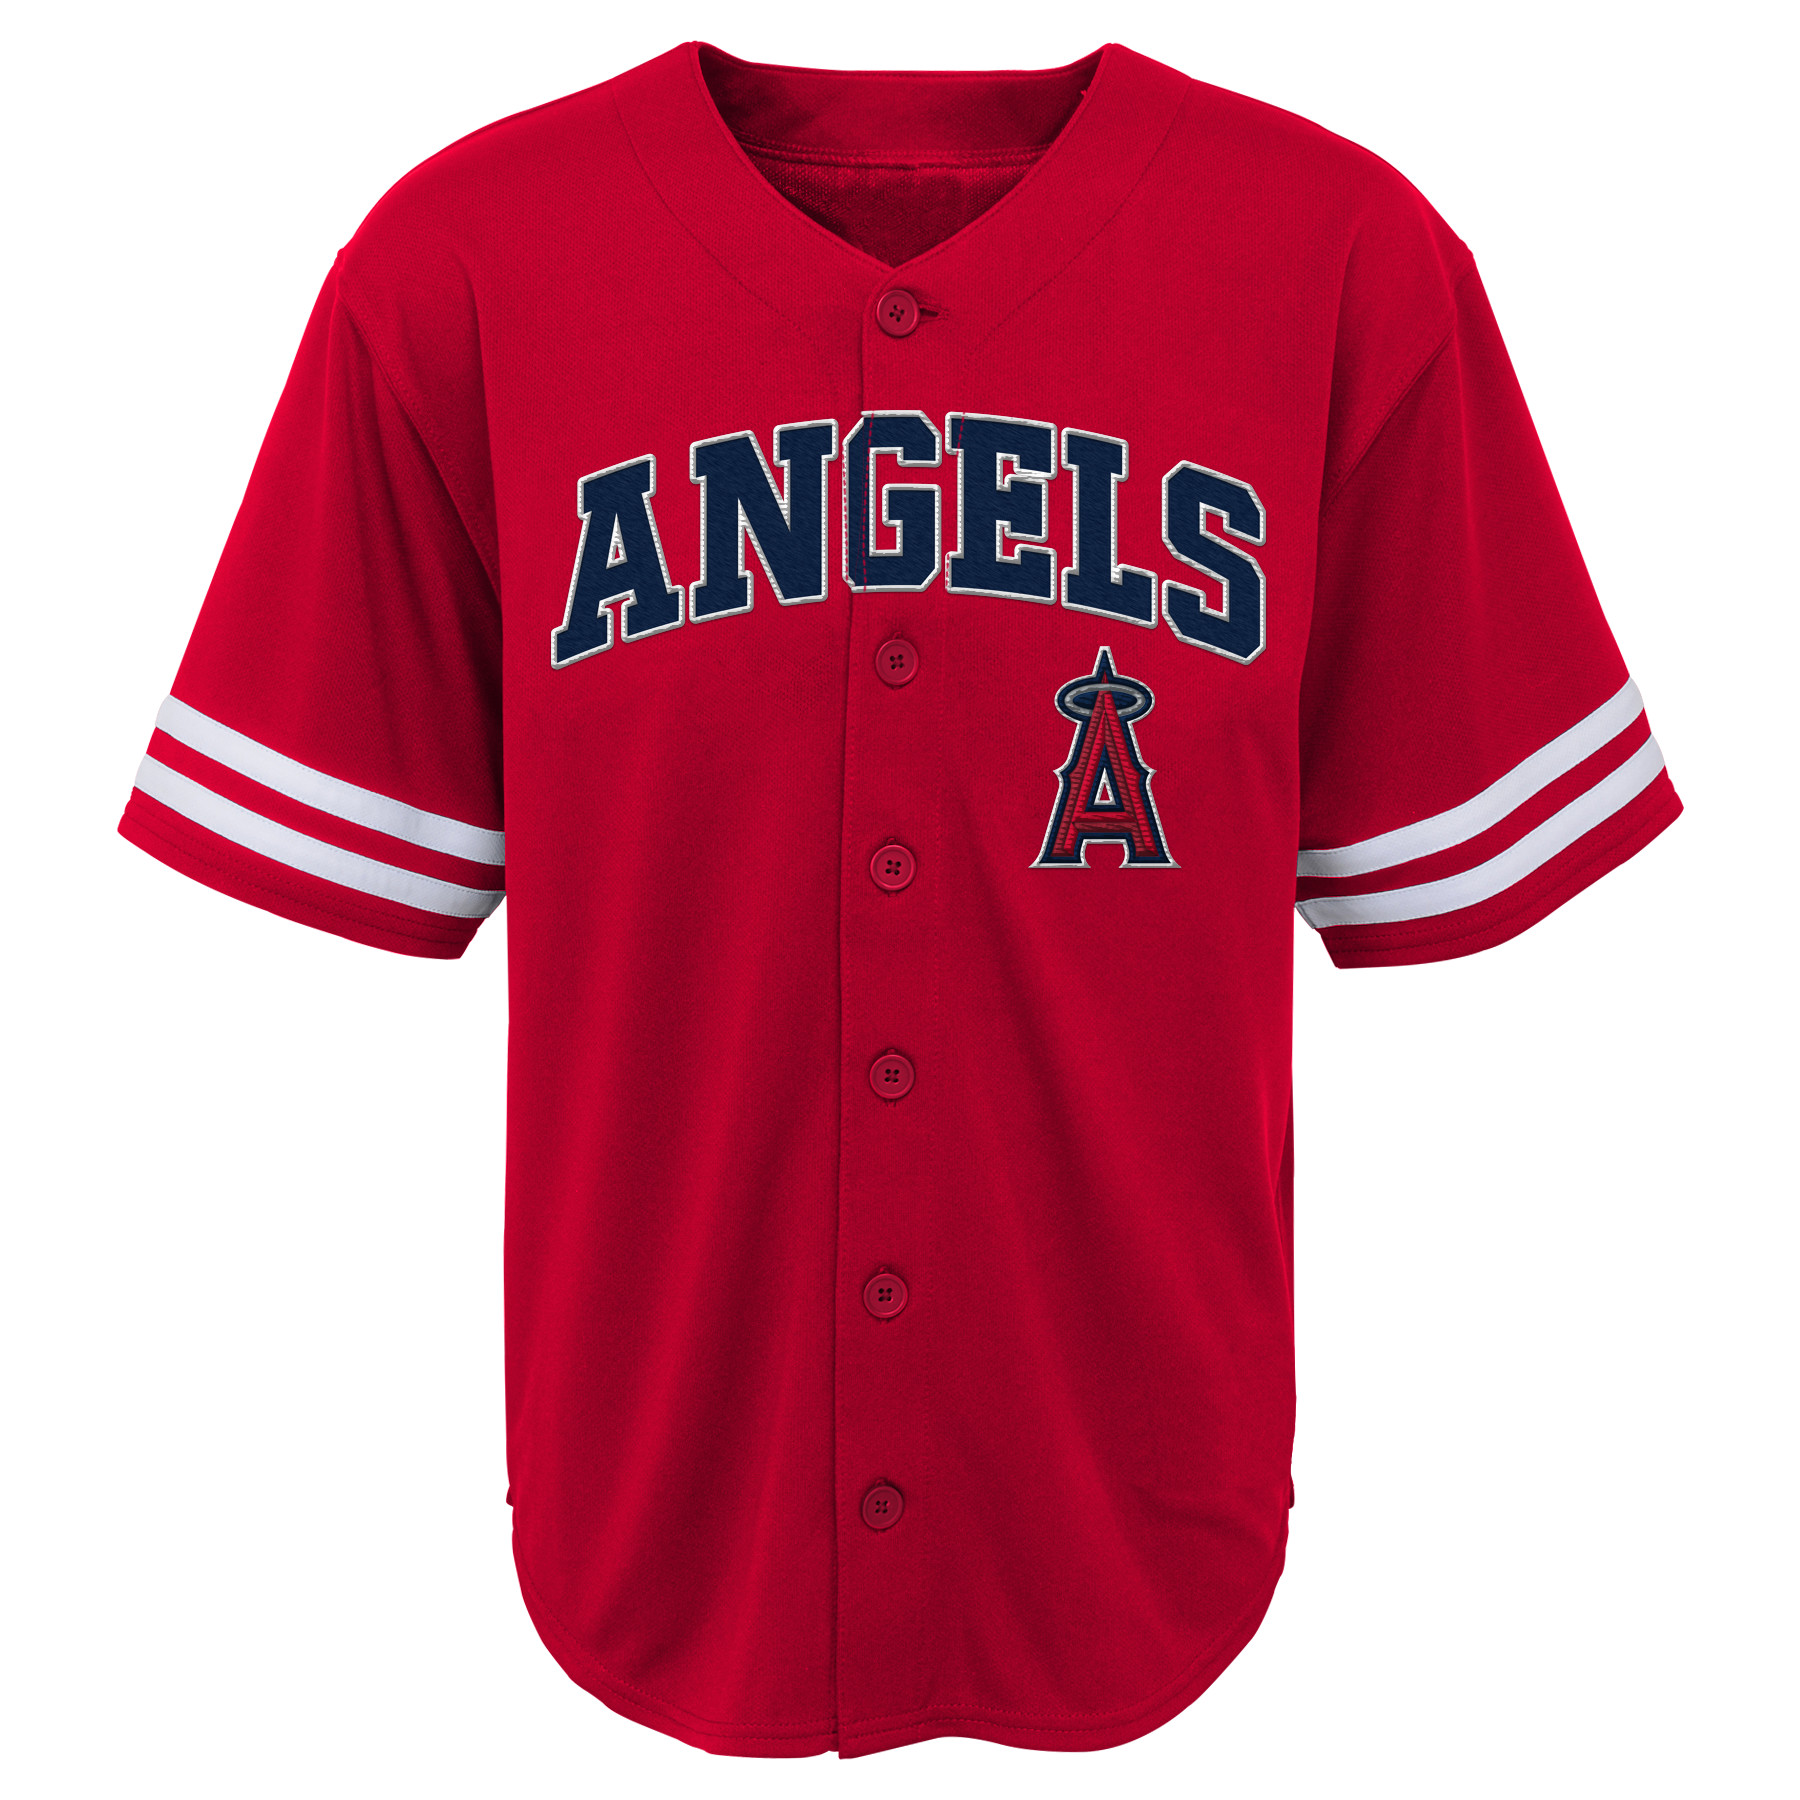 MLB Los Angeles ANGELS TEE Short Sleeve Boys Fashion Jersey Tee 60% Cotton 40% Polyester BLACK Team Tee 4-18